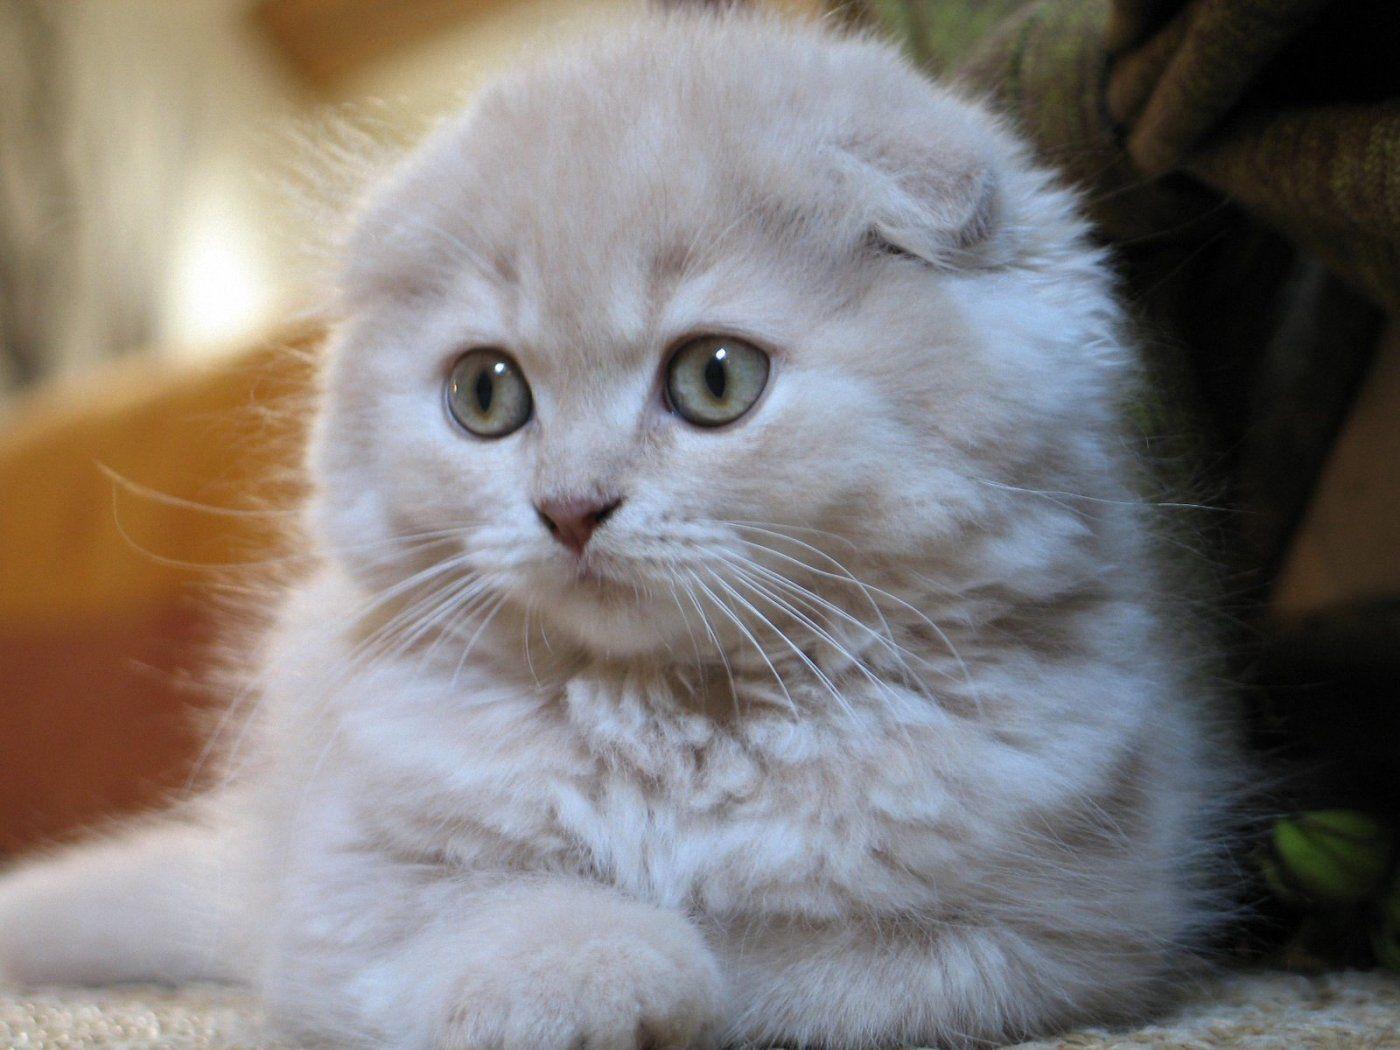 Cats Scottish Fold Scottish Fold Kittens Cat Scottish Fold Cat Breeds